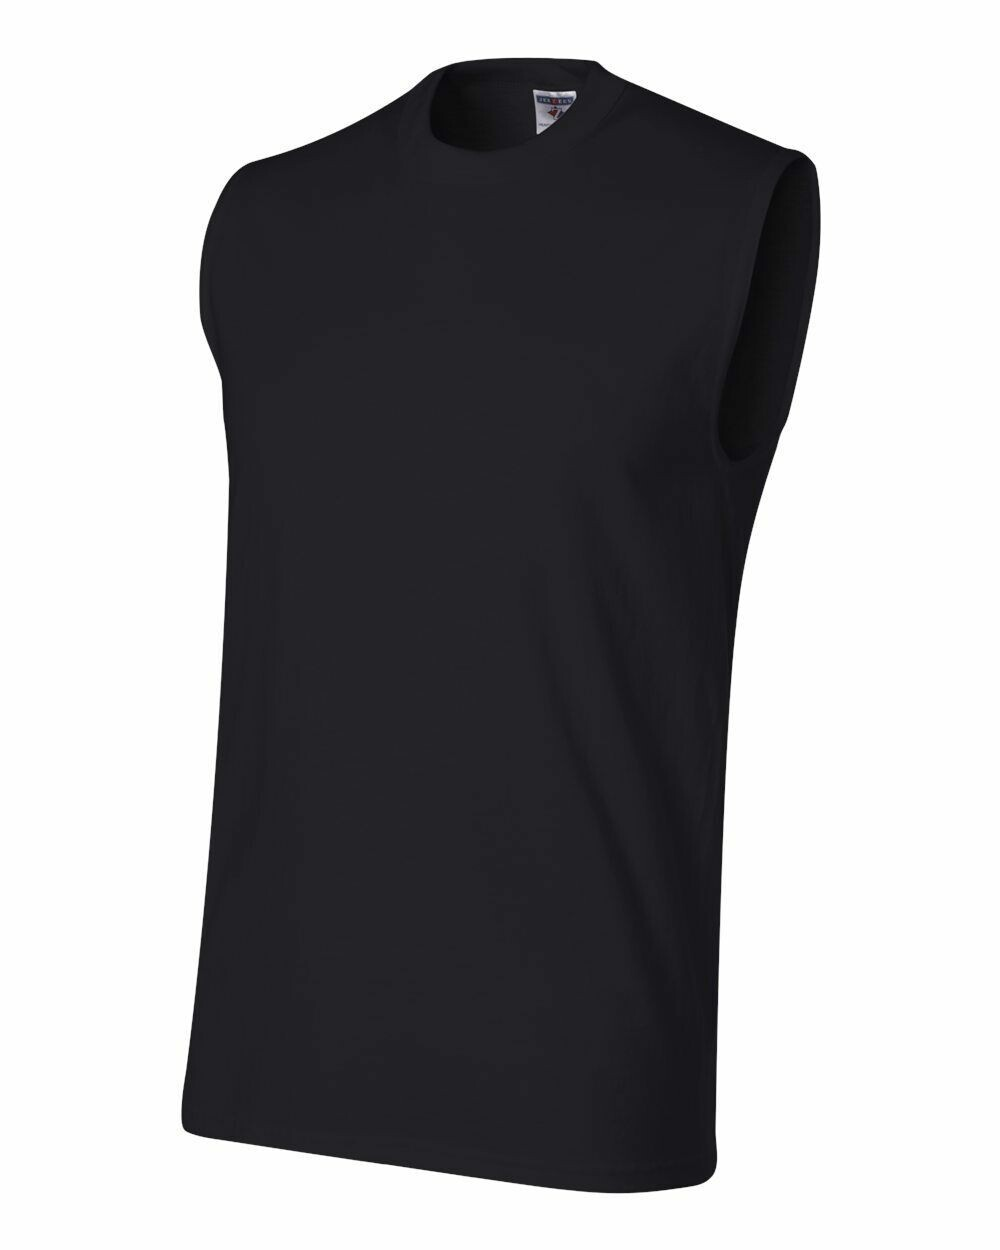 Jerzee Muscle Sleeveless HiDensi-T t-shirt 49MR S-XL 100%cotton